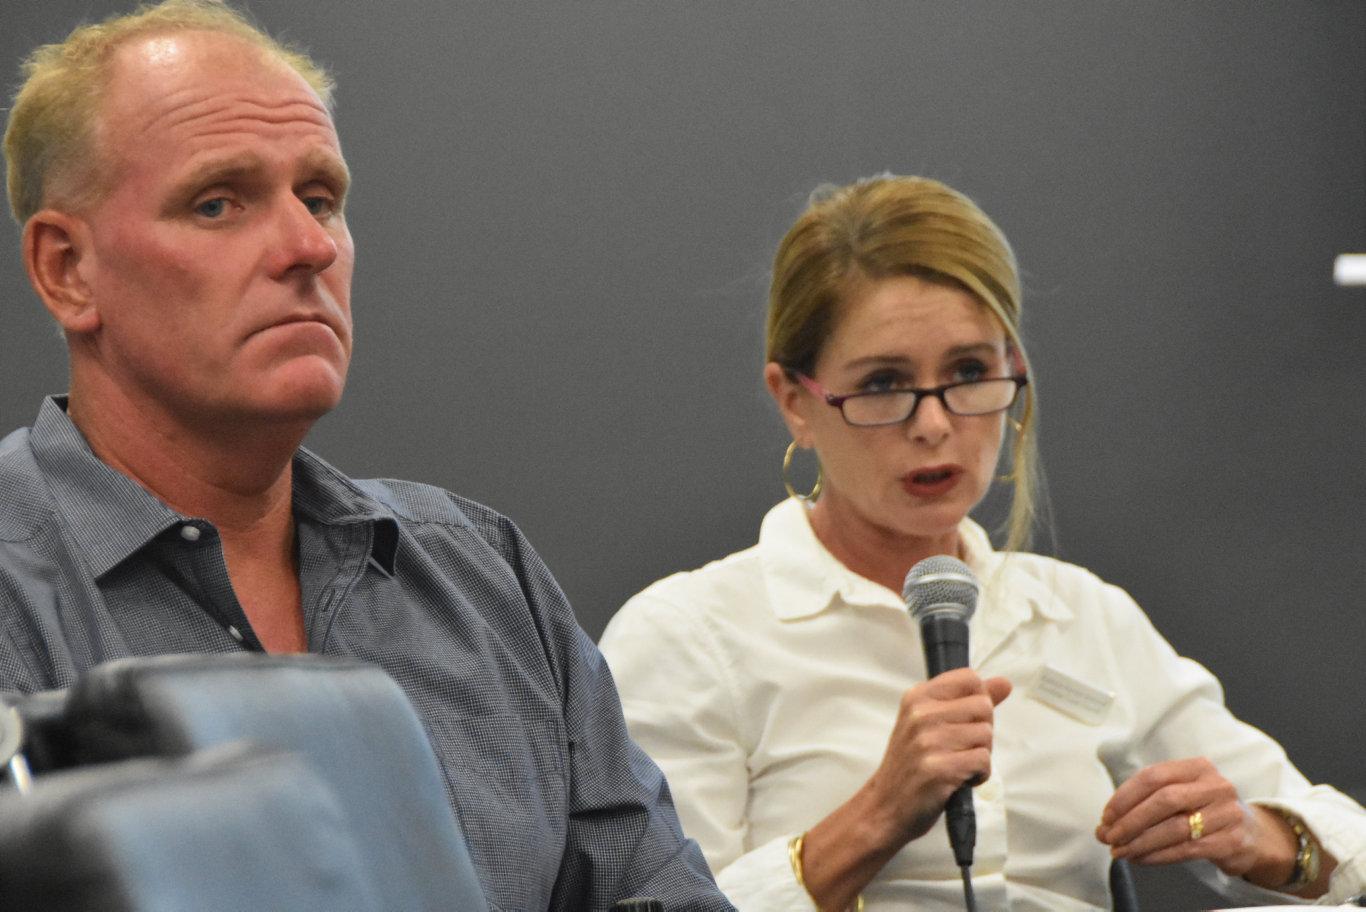 Division 8 candidates Jason O'Pray and Kathryn Hyman at Sunshine Coast Daily election forum.